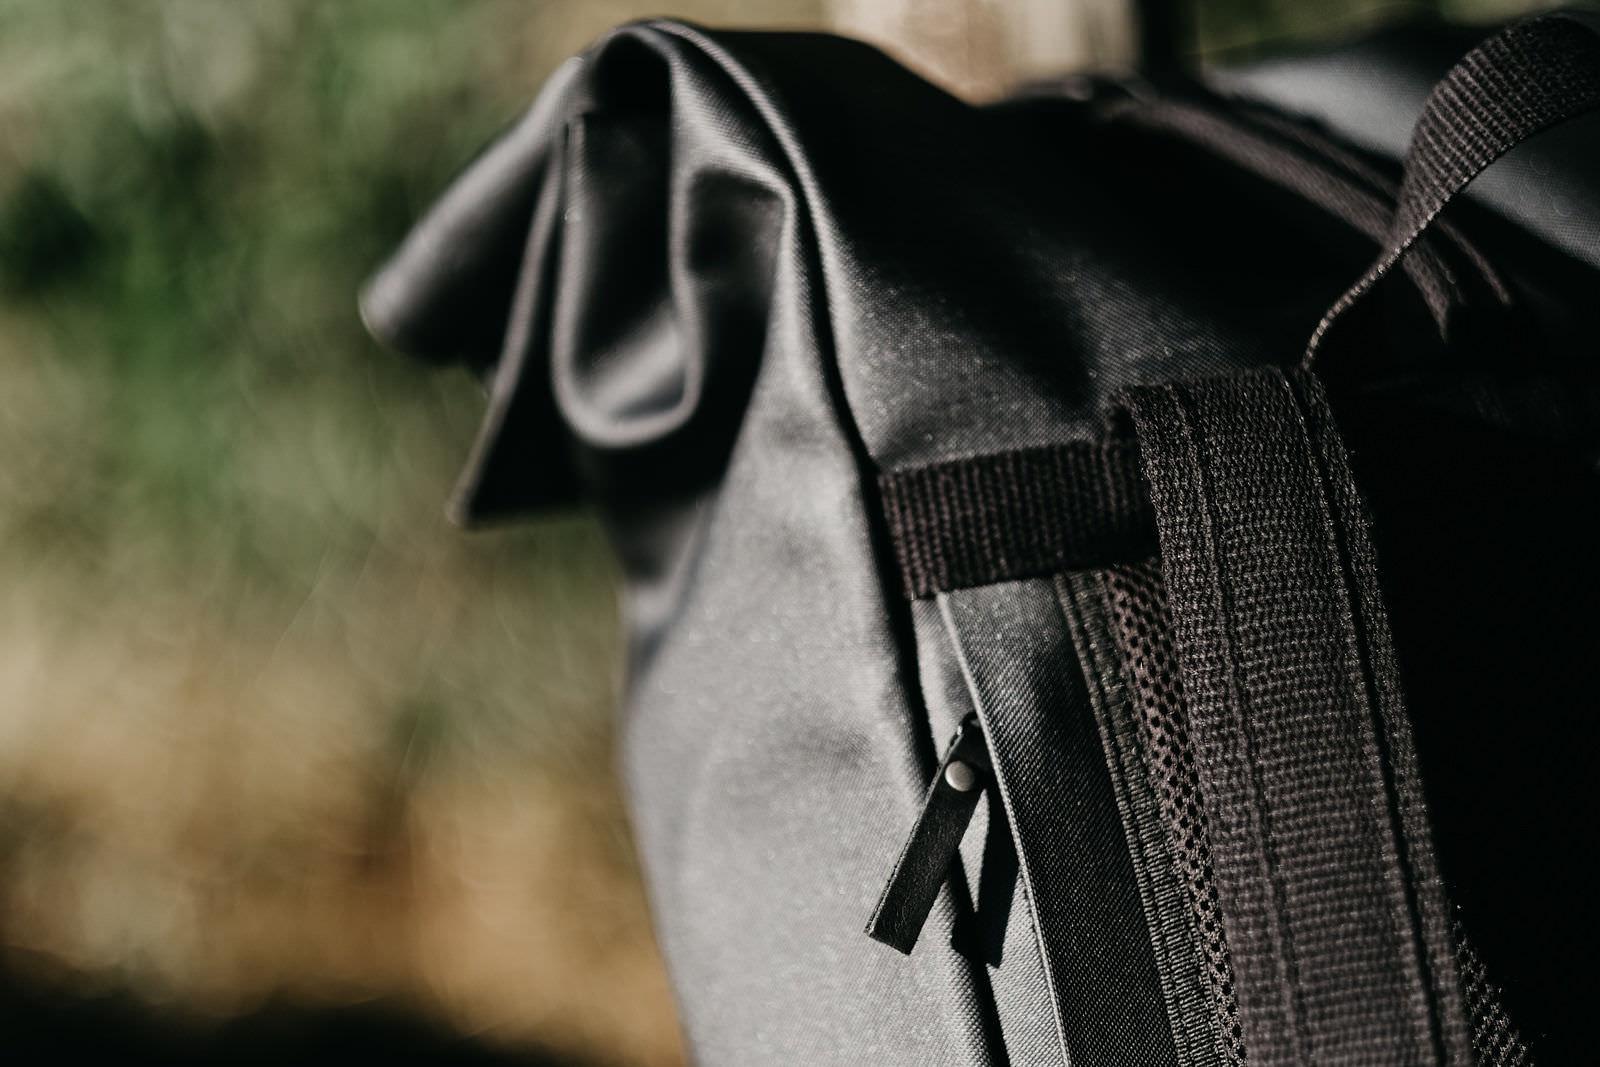 Fotografo de moda e produto para ecommerce - Kraxe-Wien